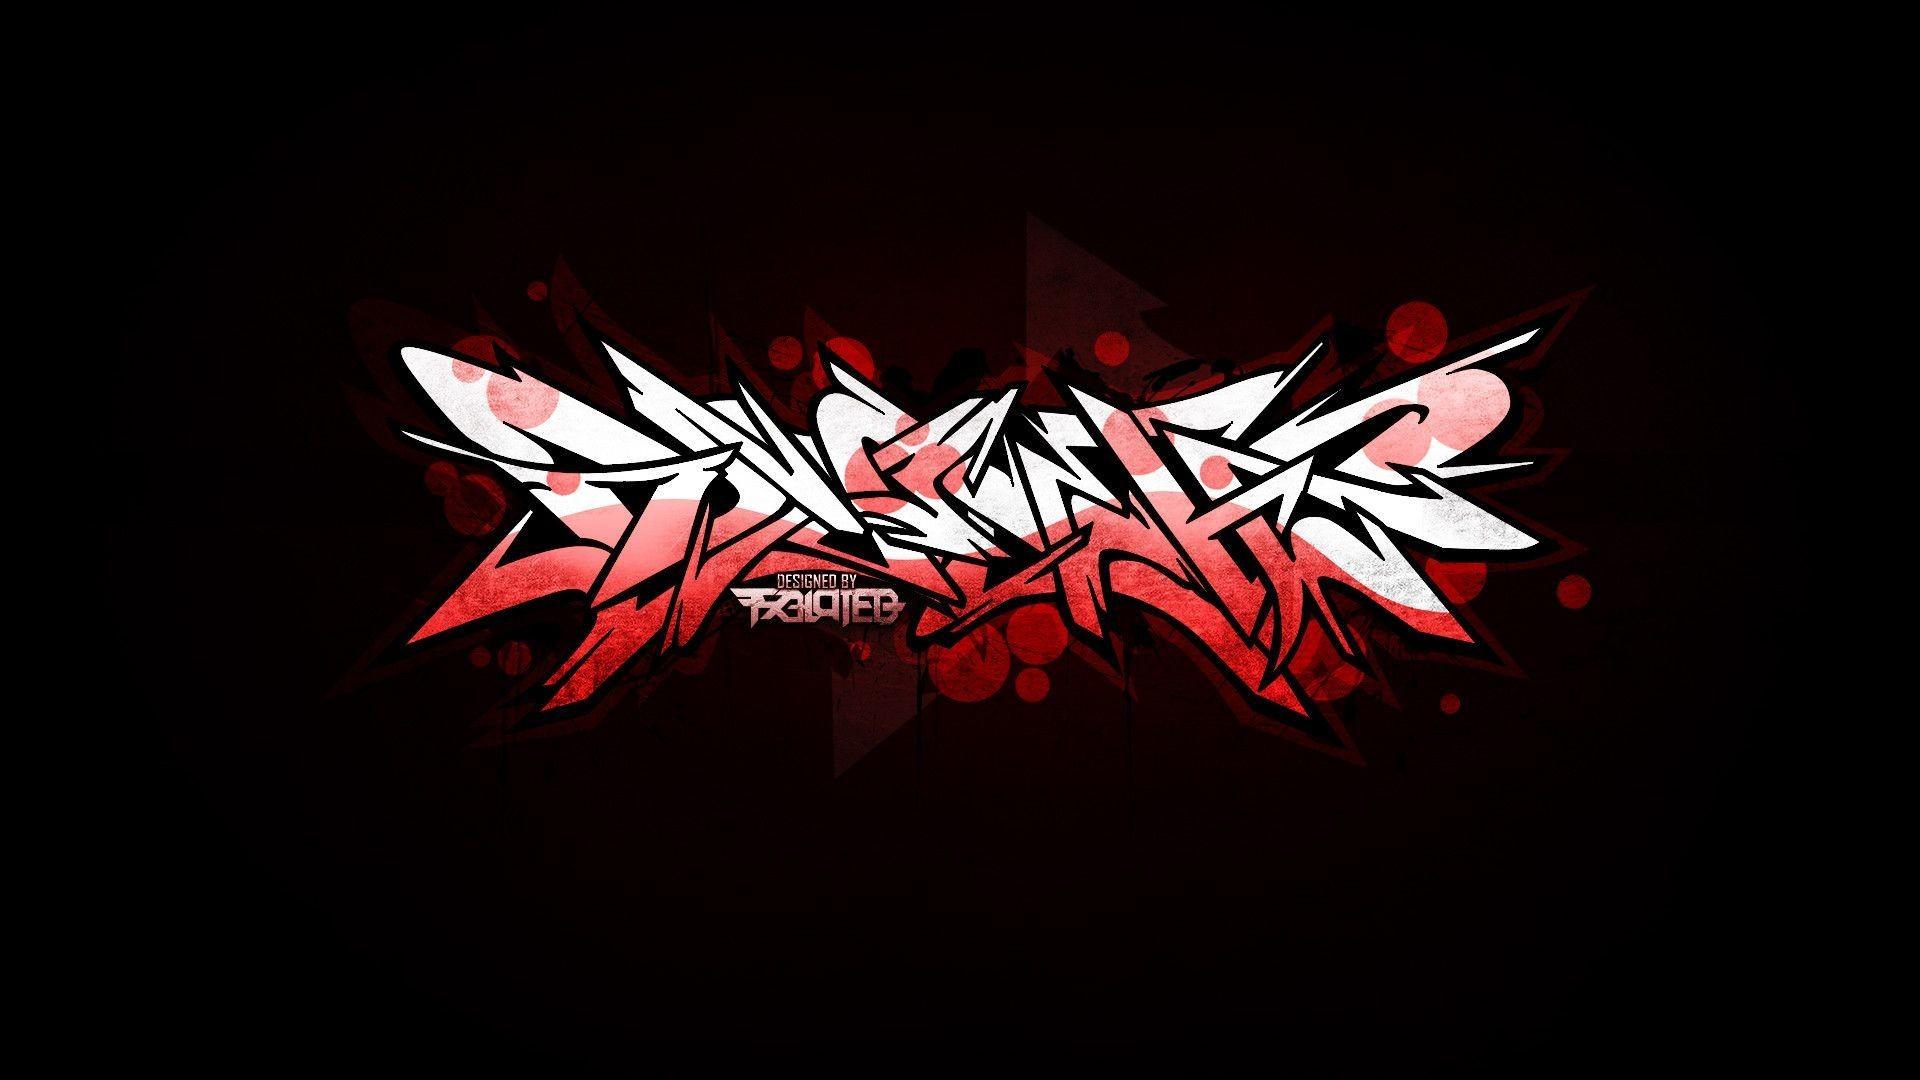 Abstract Graffiti Wallpaper 65 Images